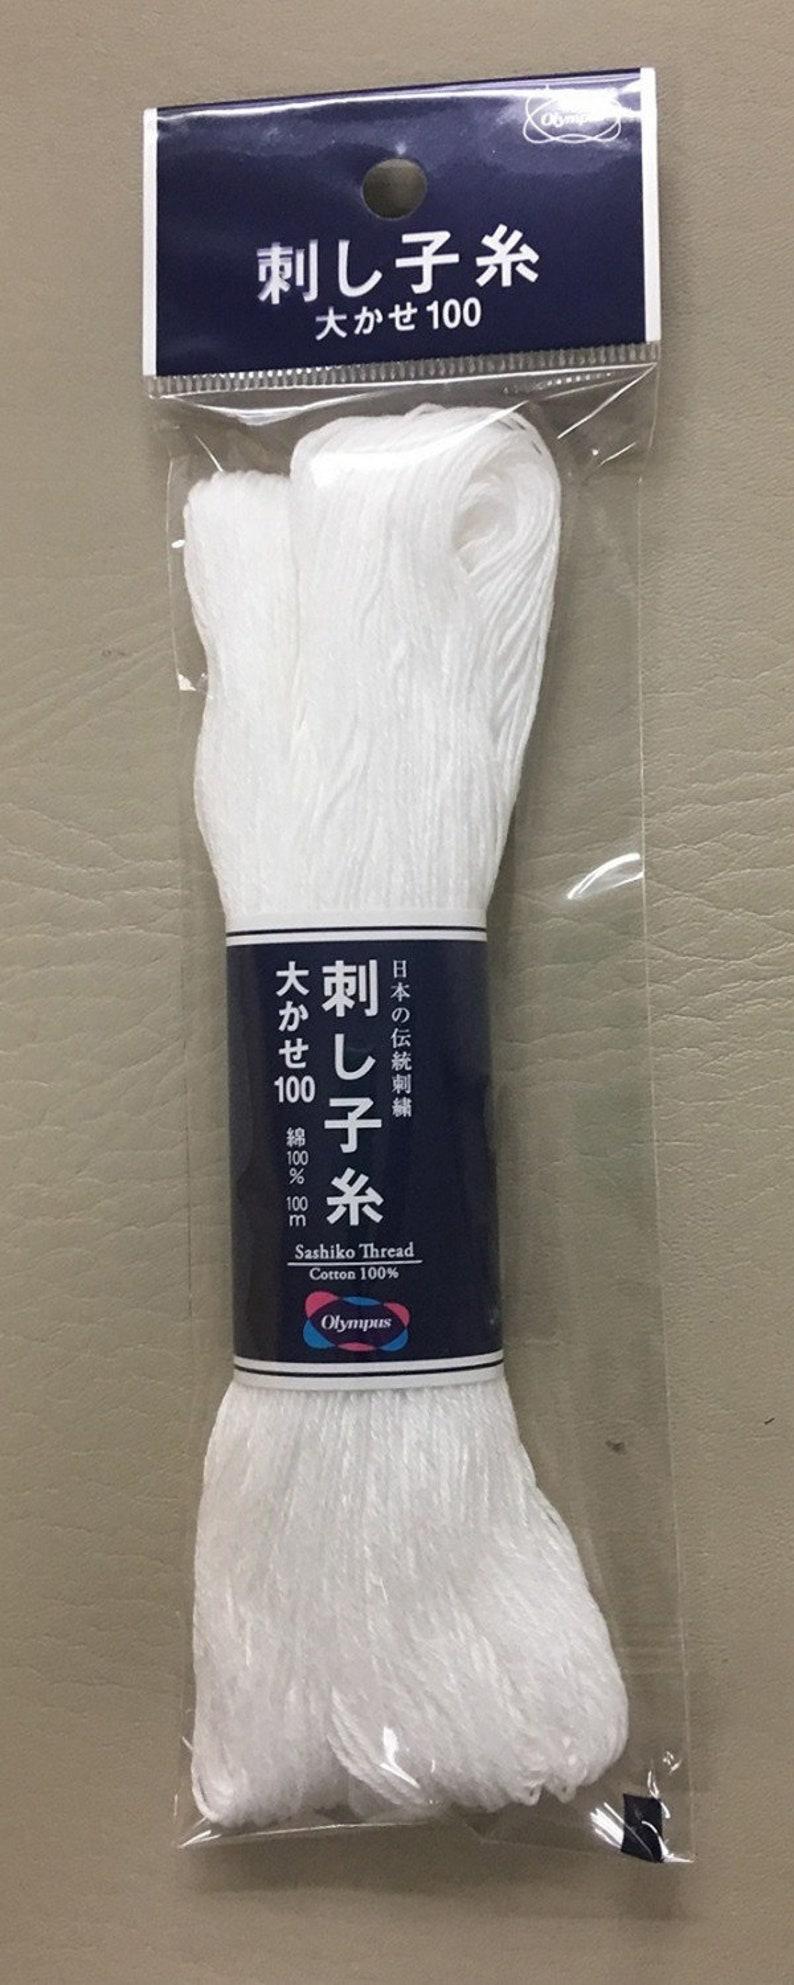 Sashiko thread white 111 yard skein ST-01-01